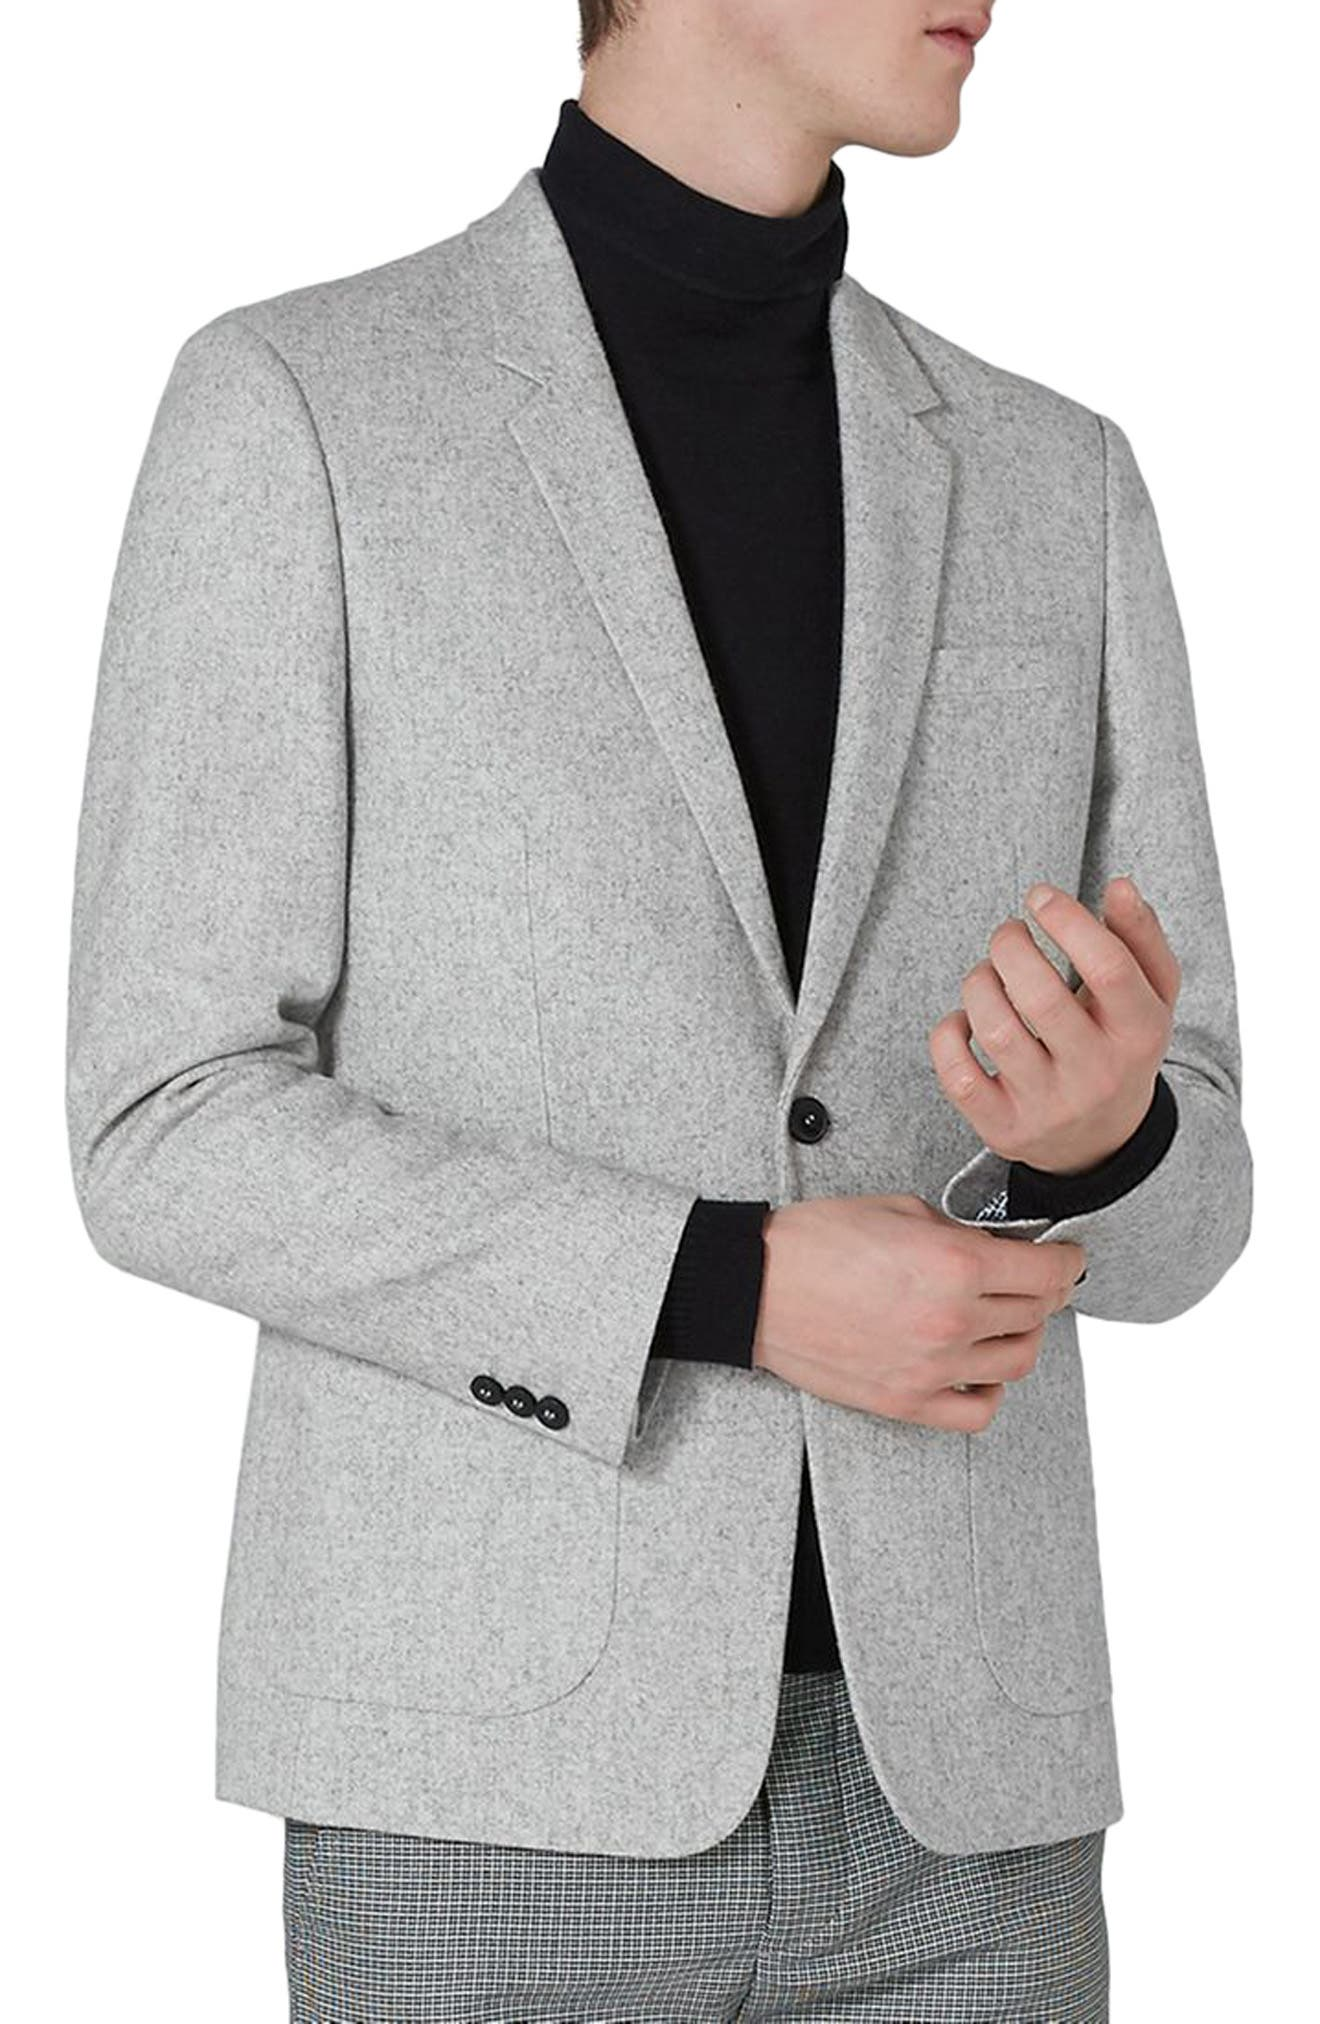 Murdoch One-Button Jacket,                             Main thumbnail 1, color,                             LIGHT GREY